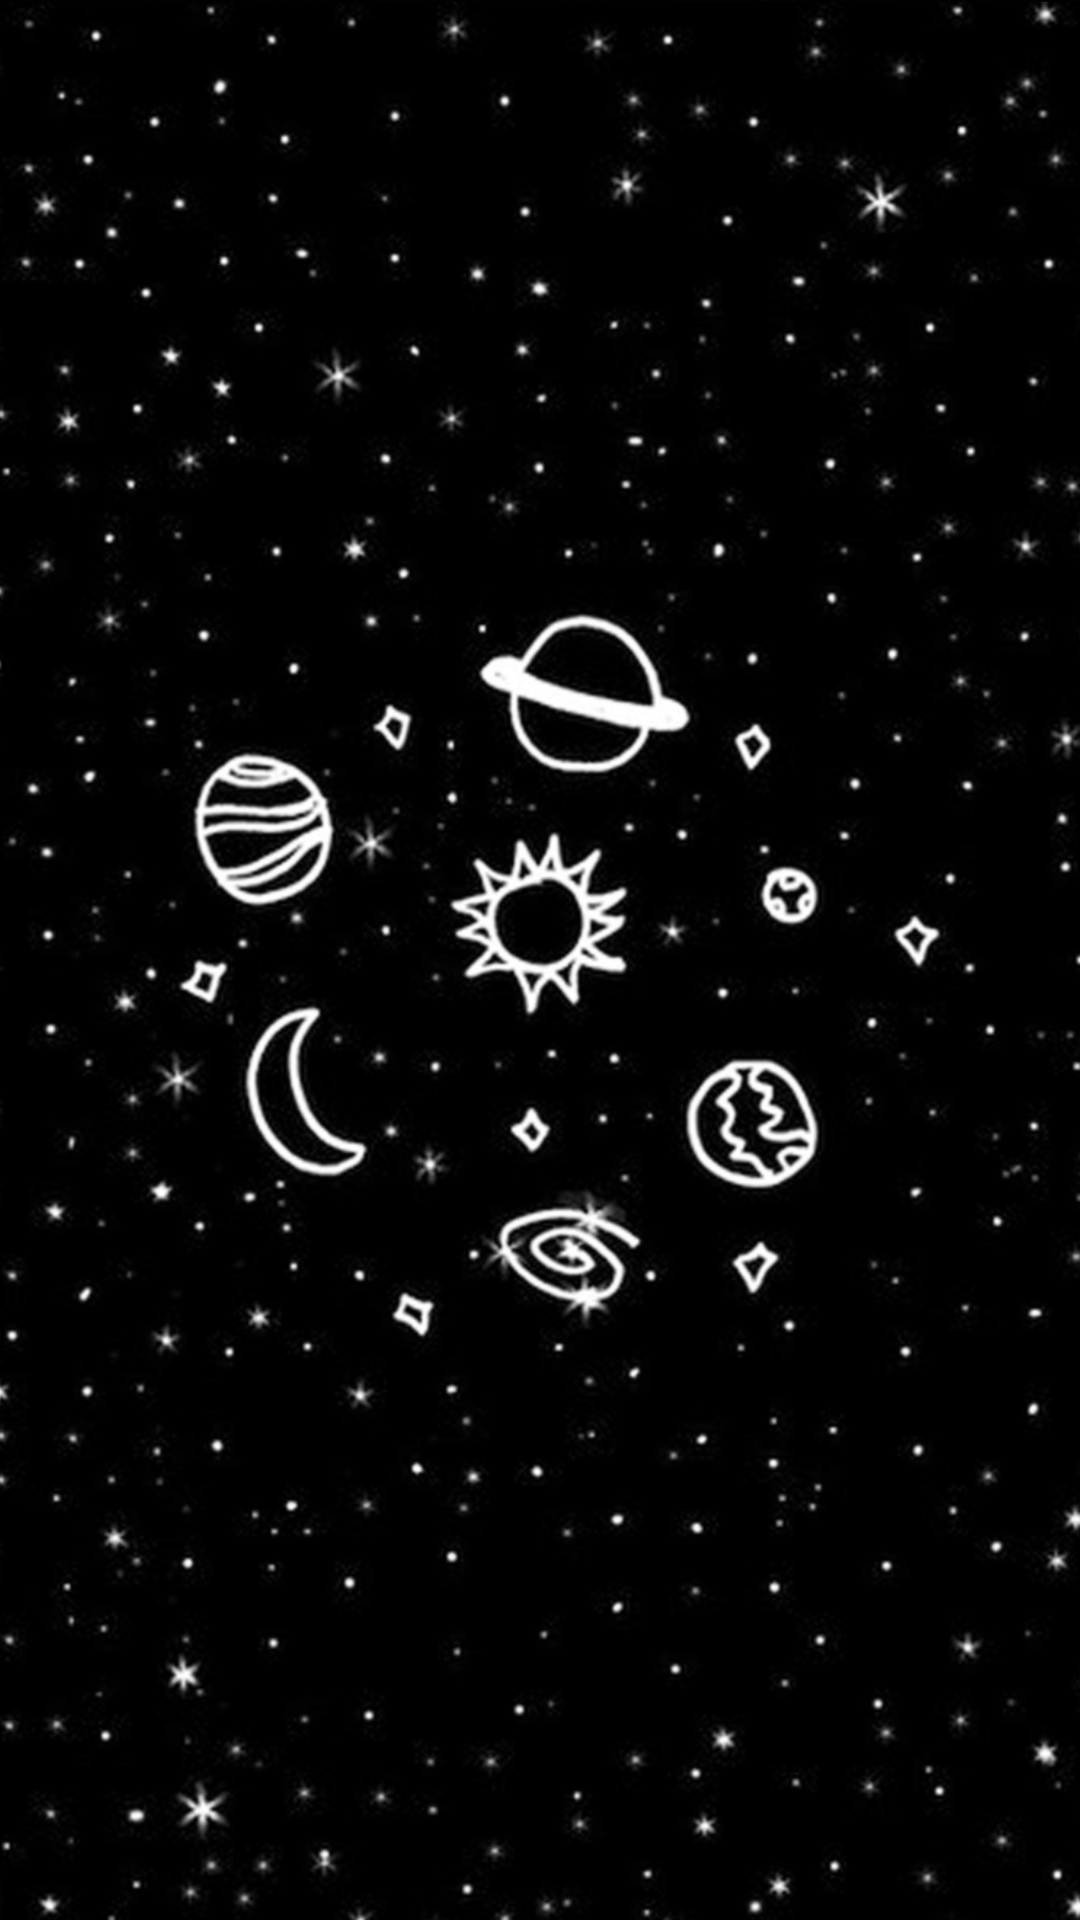 Pin De Yagmur Arslan Em Sozler Desenho Do Espaco Saturno Tumblr